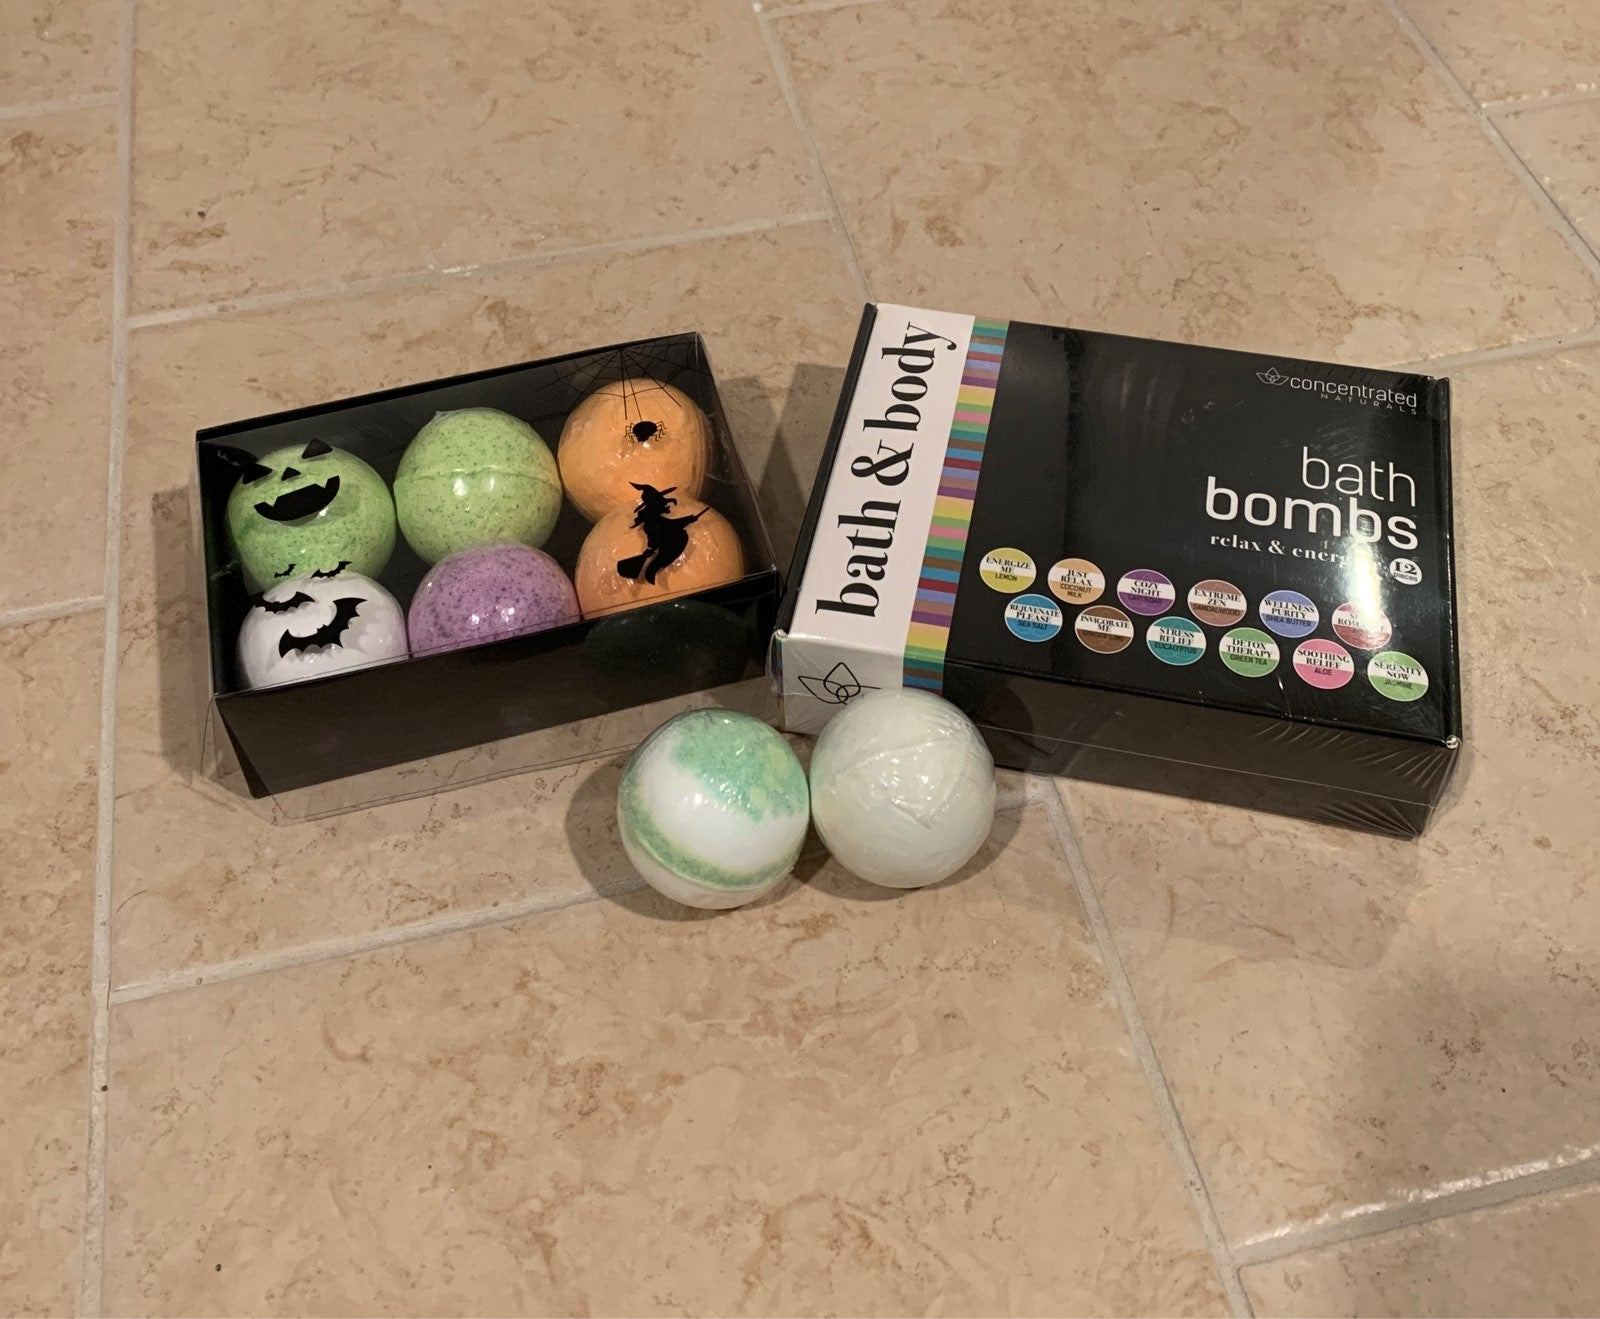 Nwt Bath bomb bundle lot